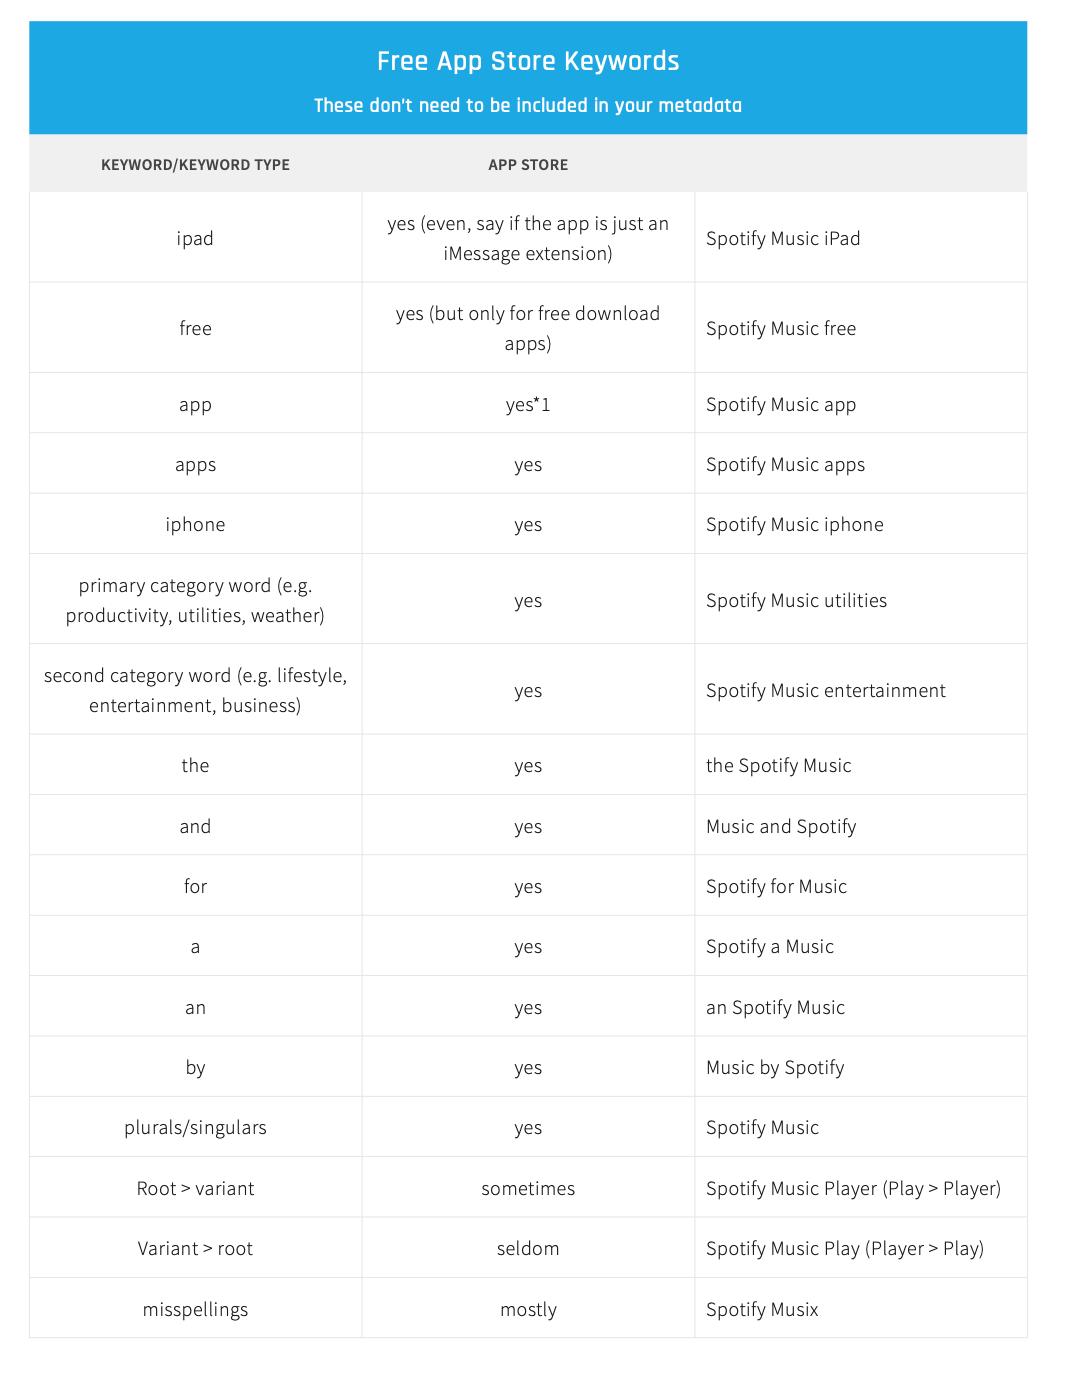 Free app store keywords